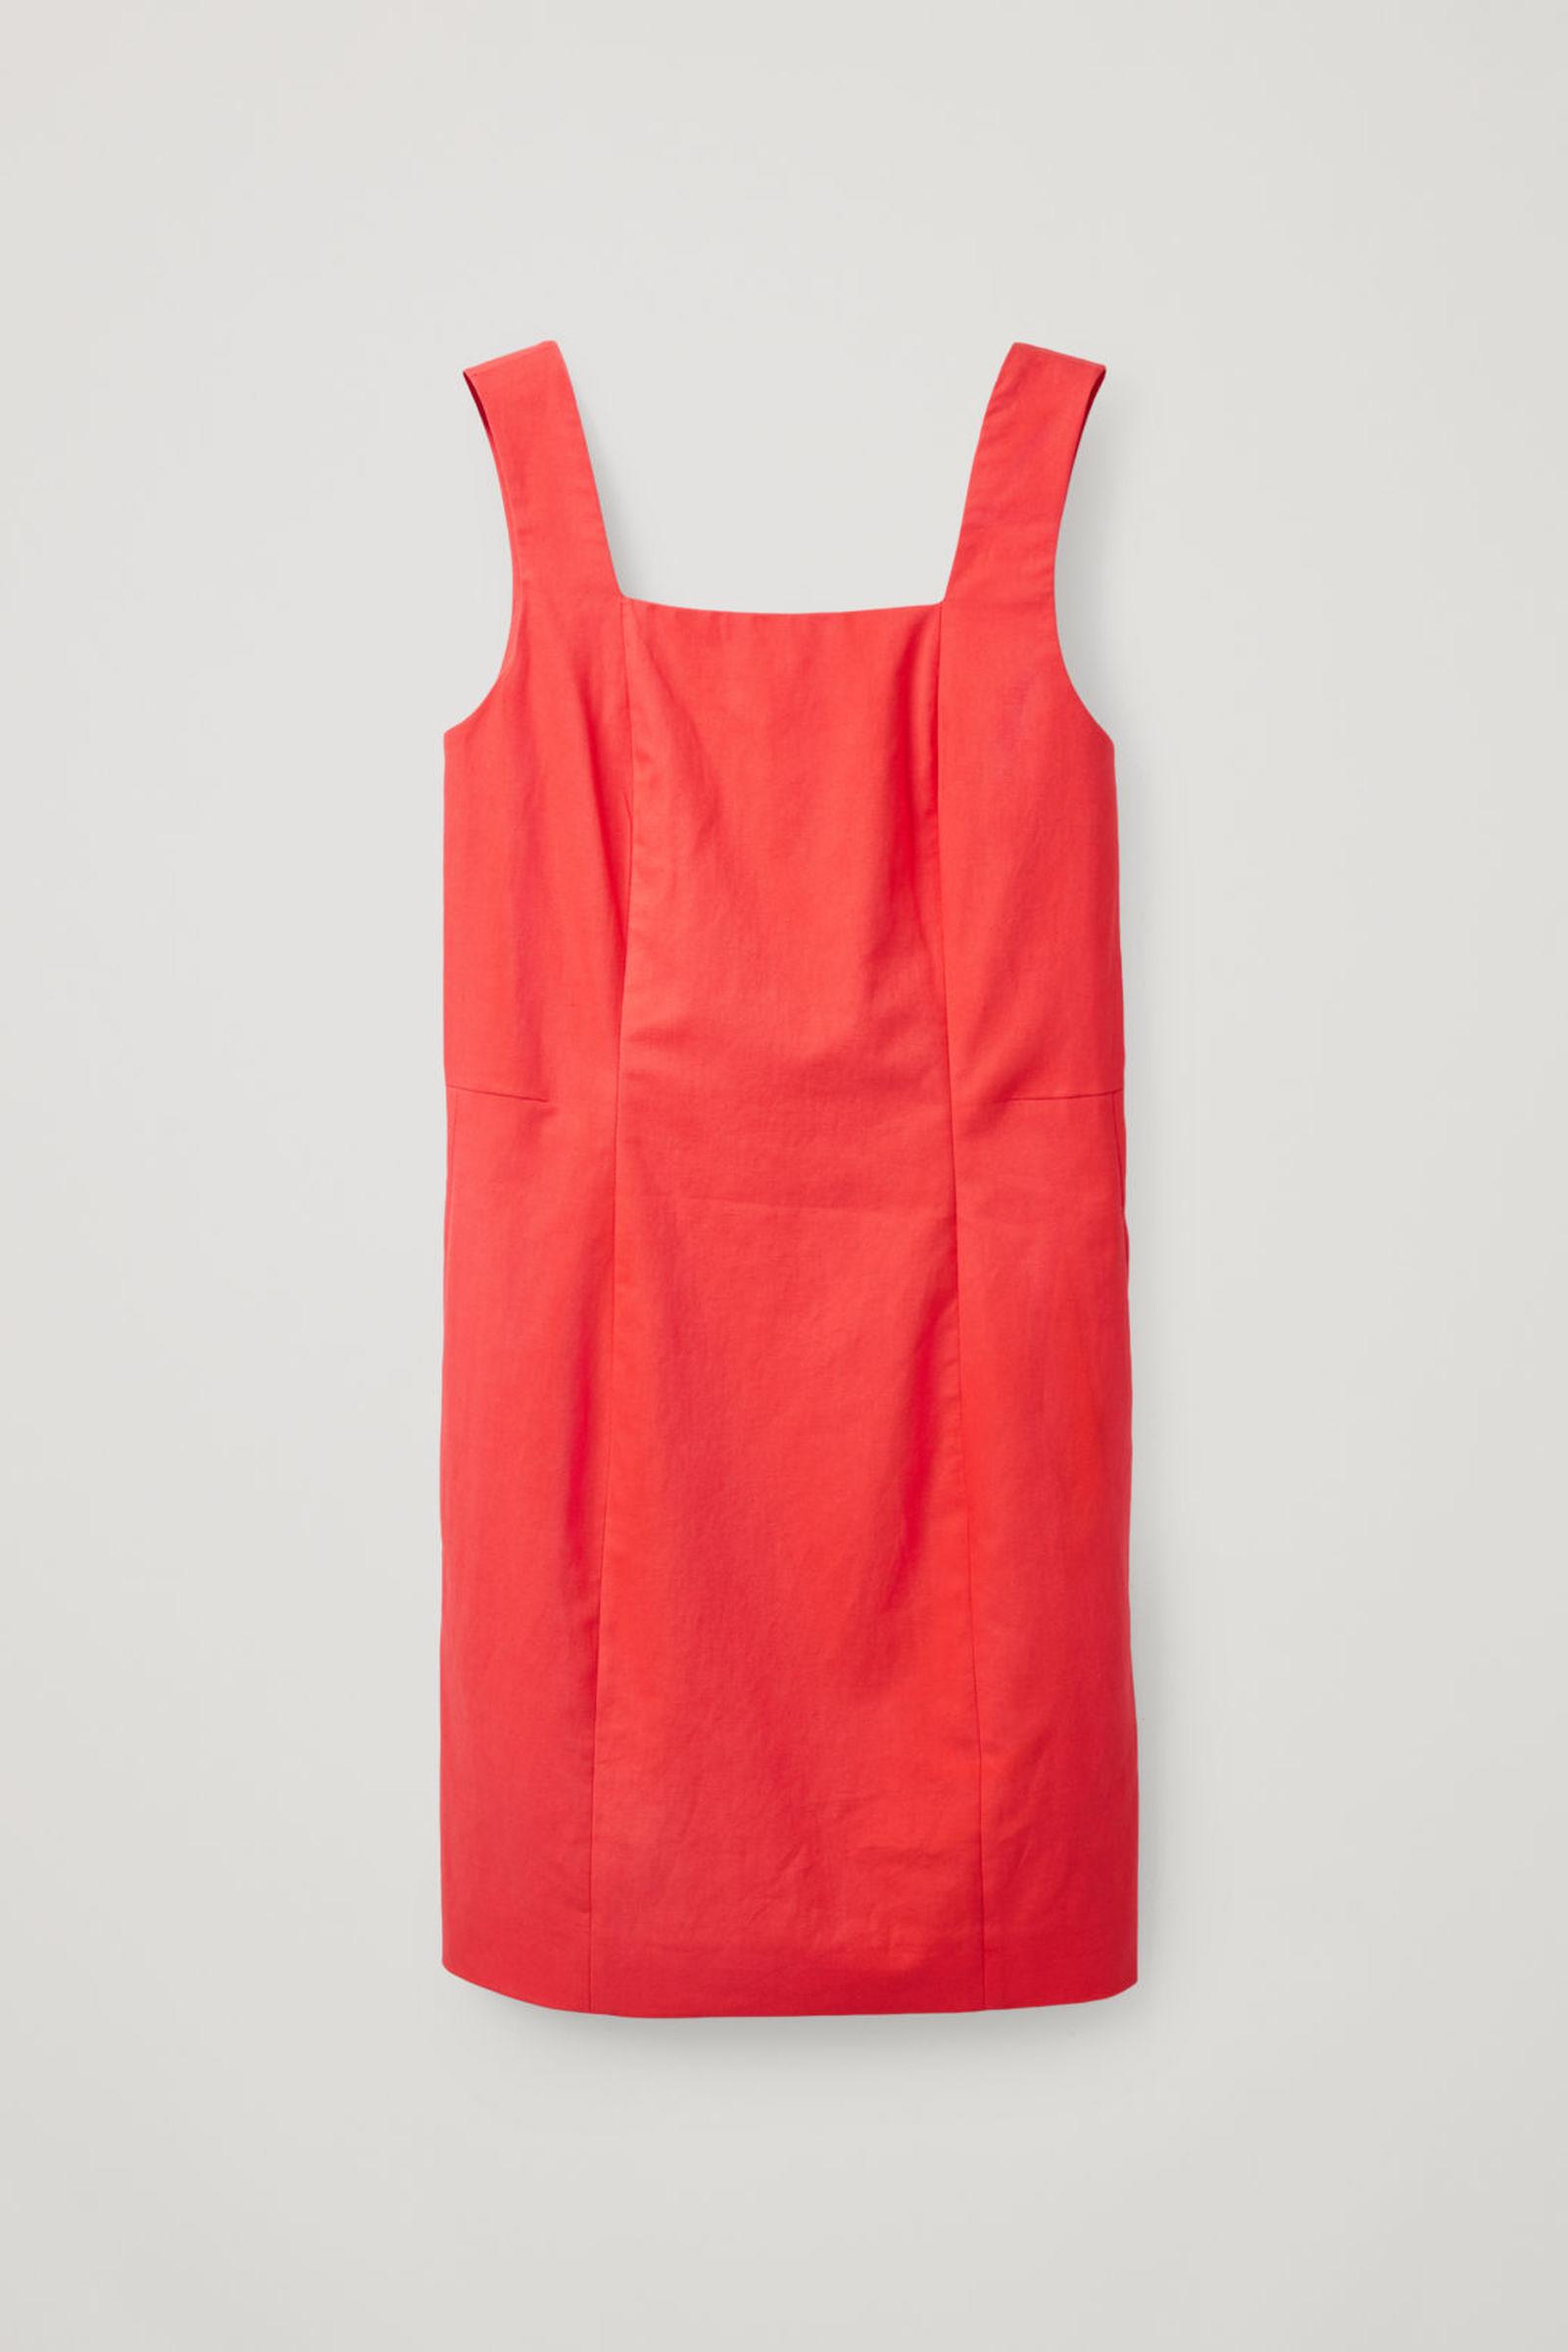 COS 슬림핏 코튼 리넨 드레스의 레드컬러 Product입니다.